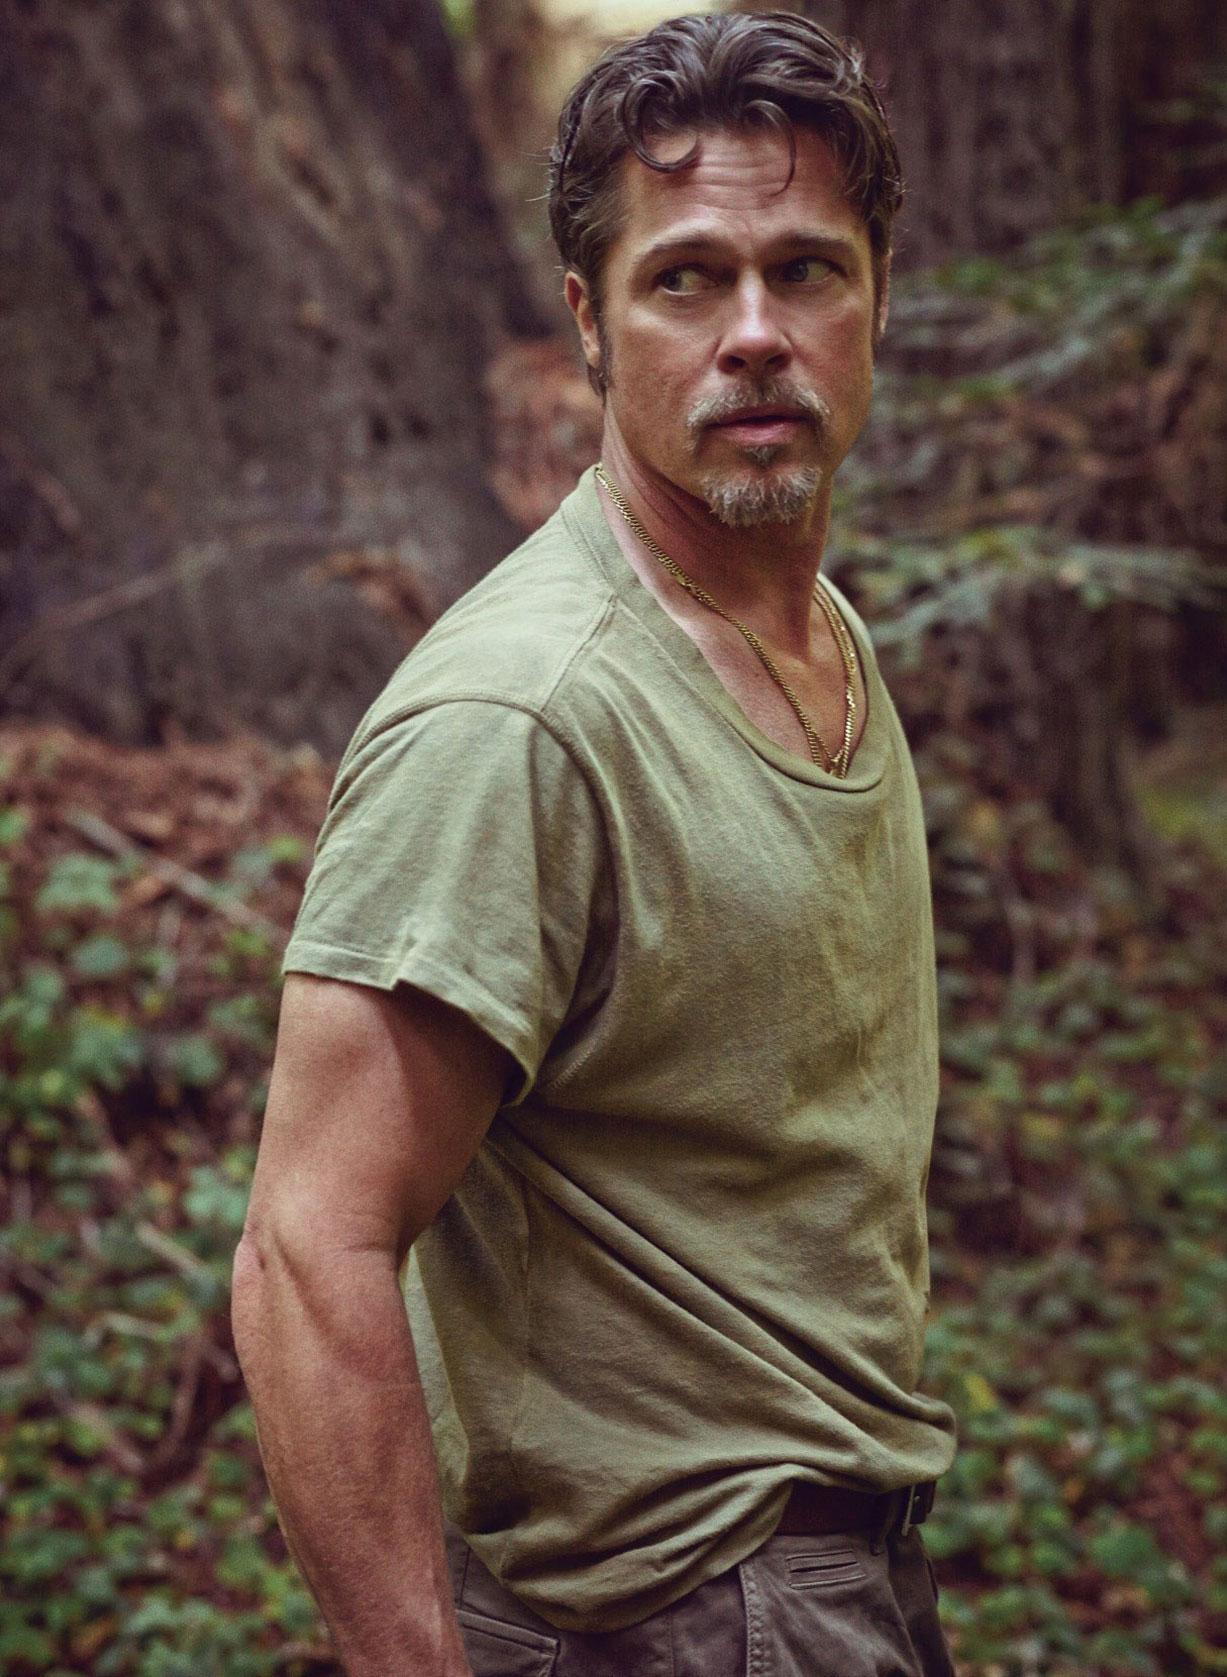 на природе с мотоциклом - Брэд Питт / Brad Pitt by Mark Seliger - Details Magazine november 2014